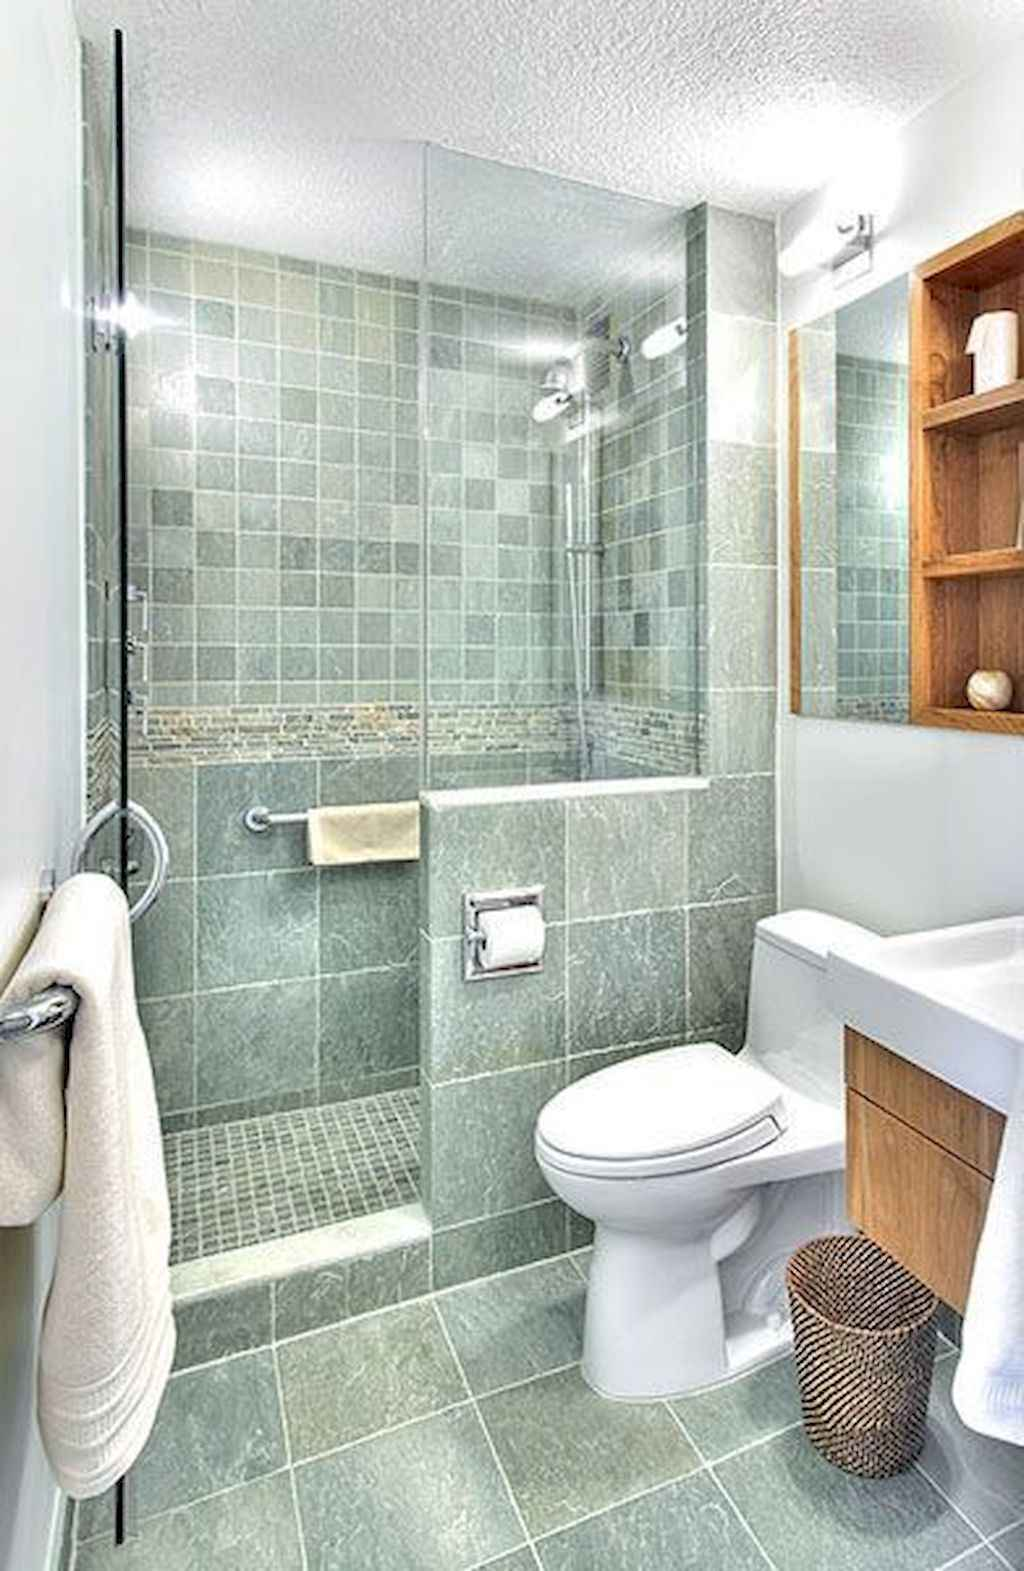 111 Brilliant Small Bathroom Remodel Ideas On A Budget (12)